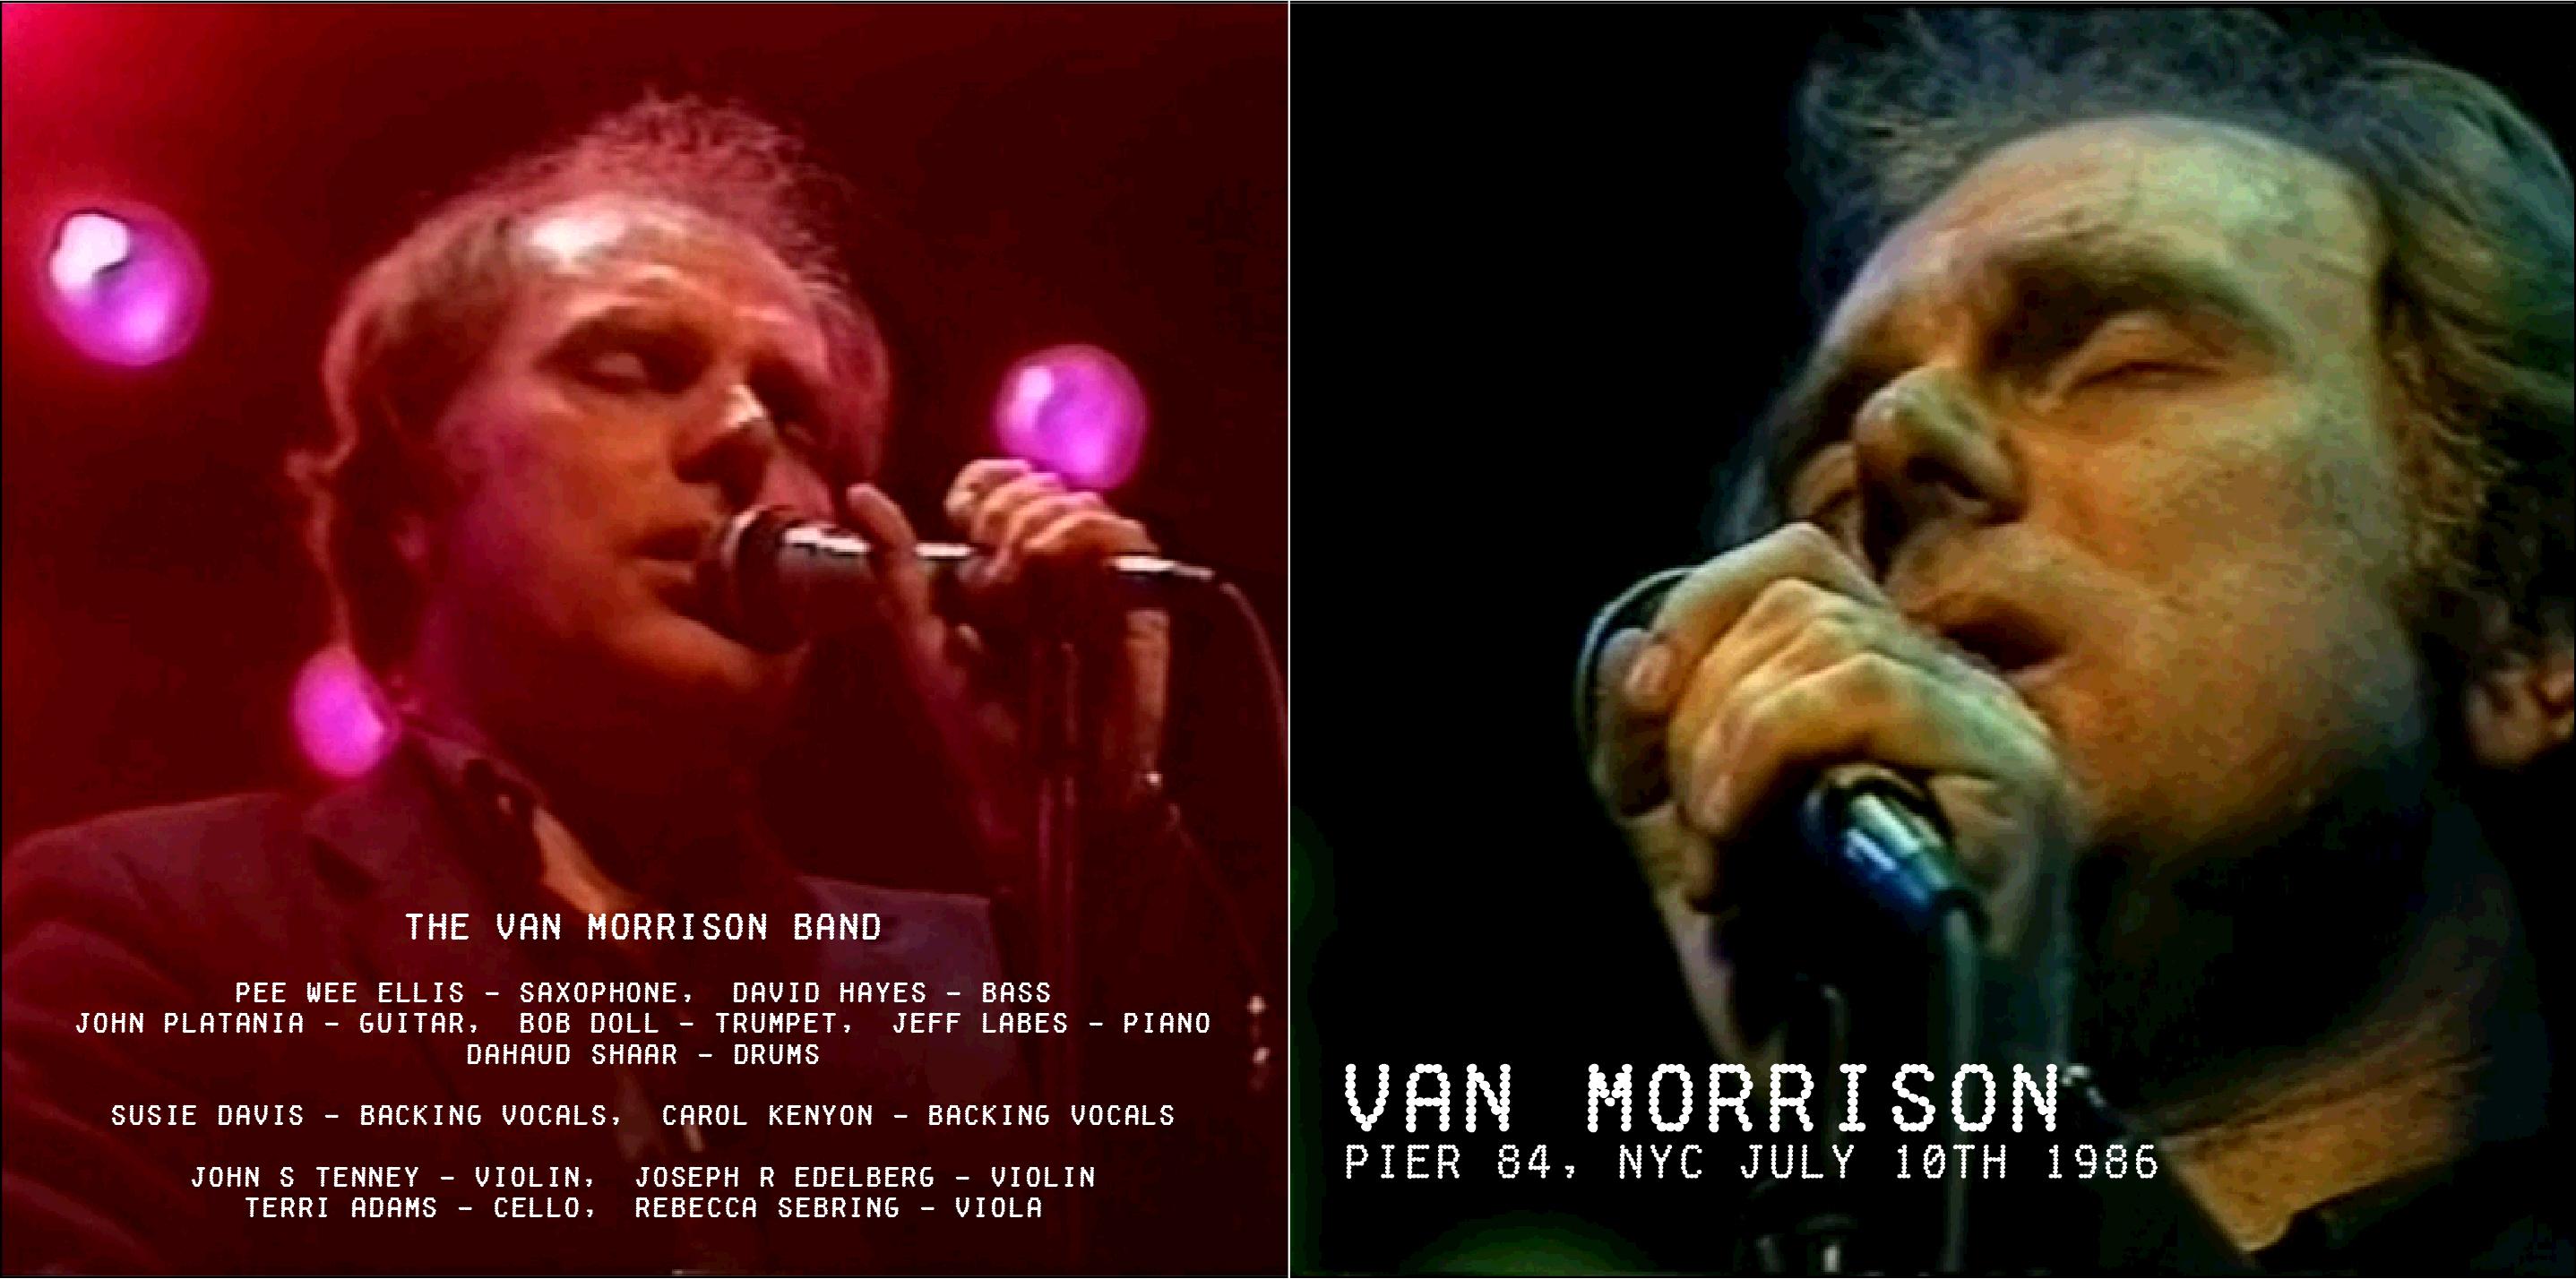 VanMorrison1984-07-10Pier84NYC.jpeg